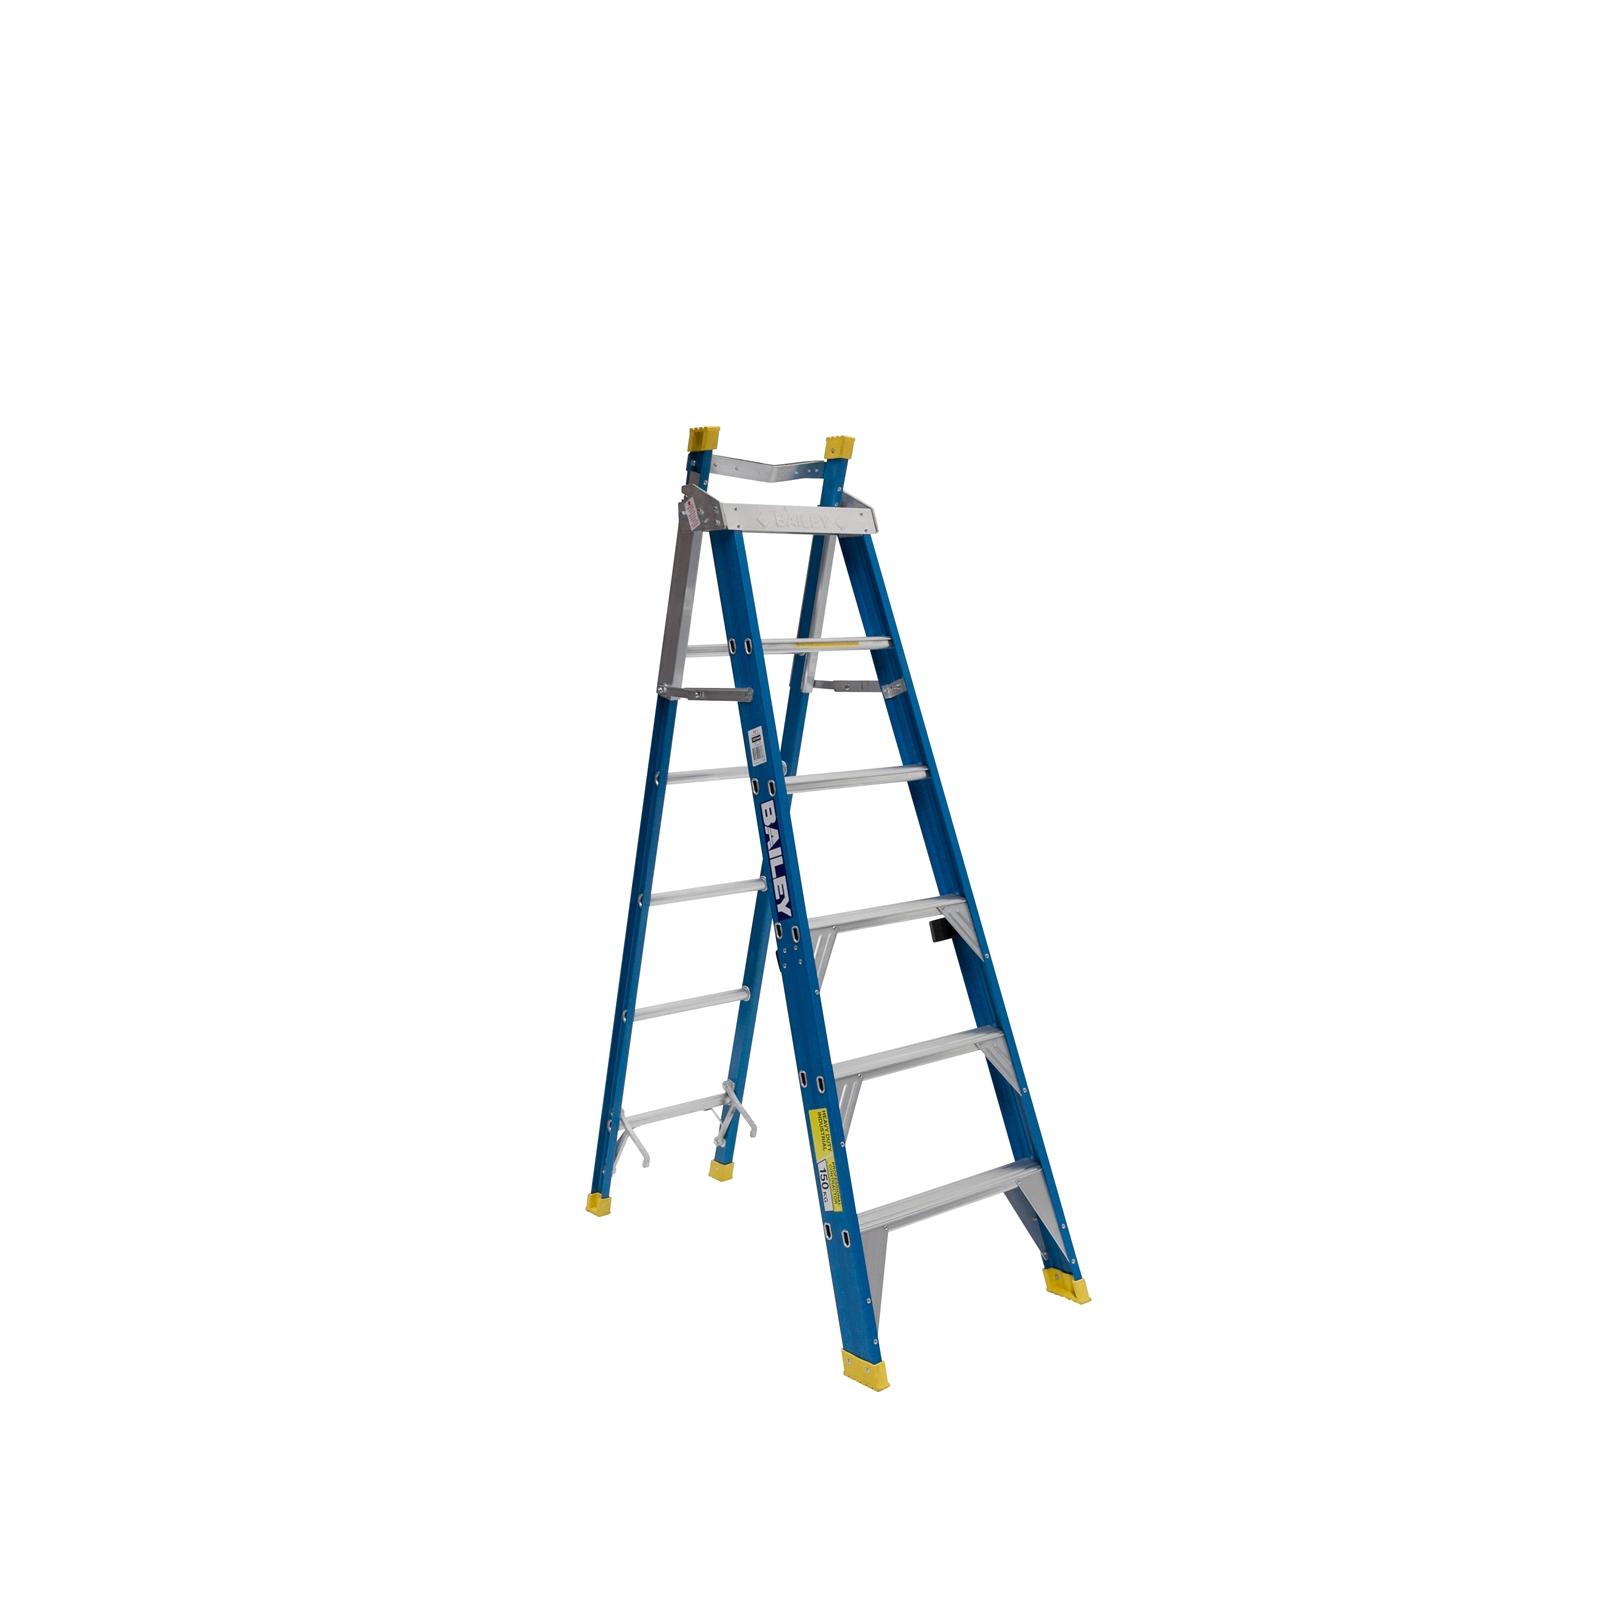 Fibreglass step extension ladder cut through gas pipe